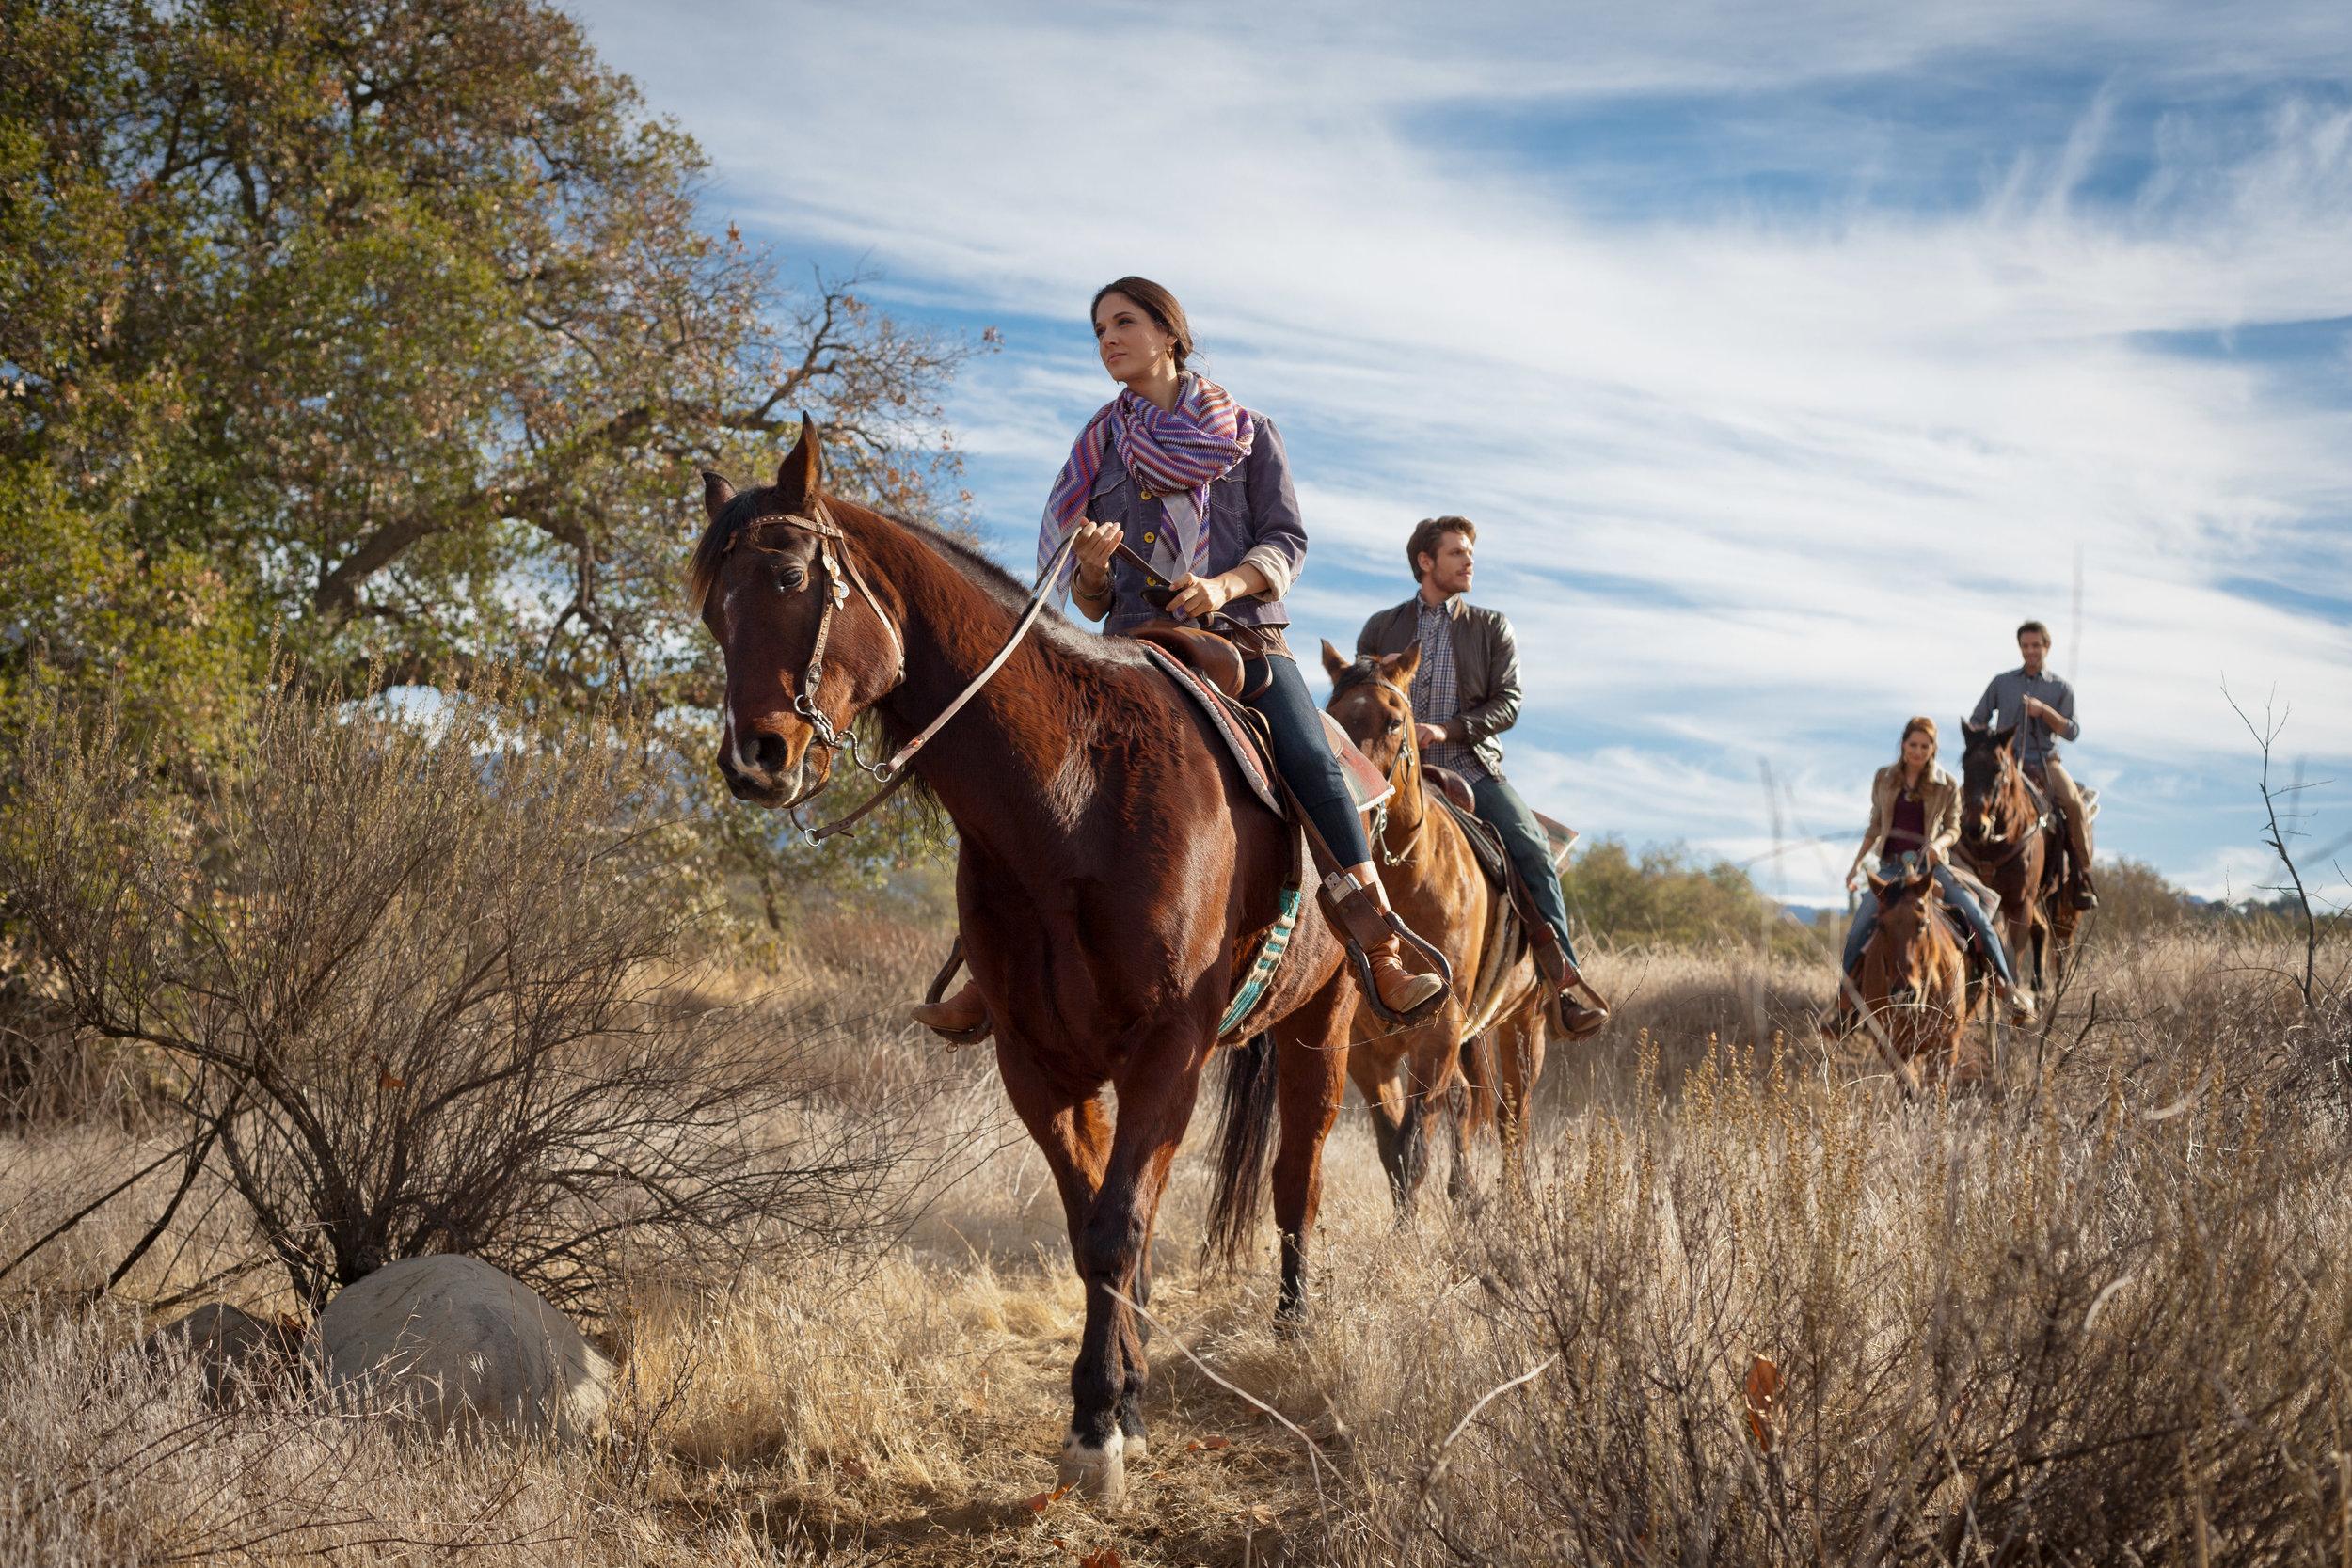 Gaszton_OVB_horsebackriding-0223.jpg